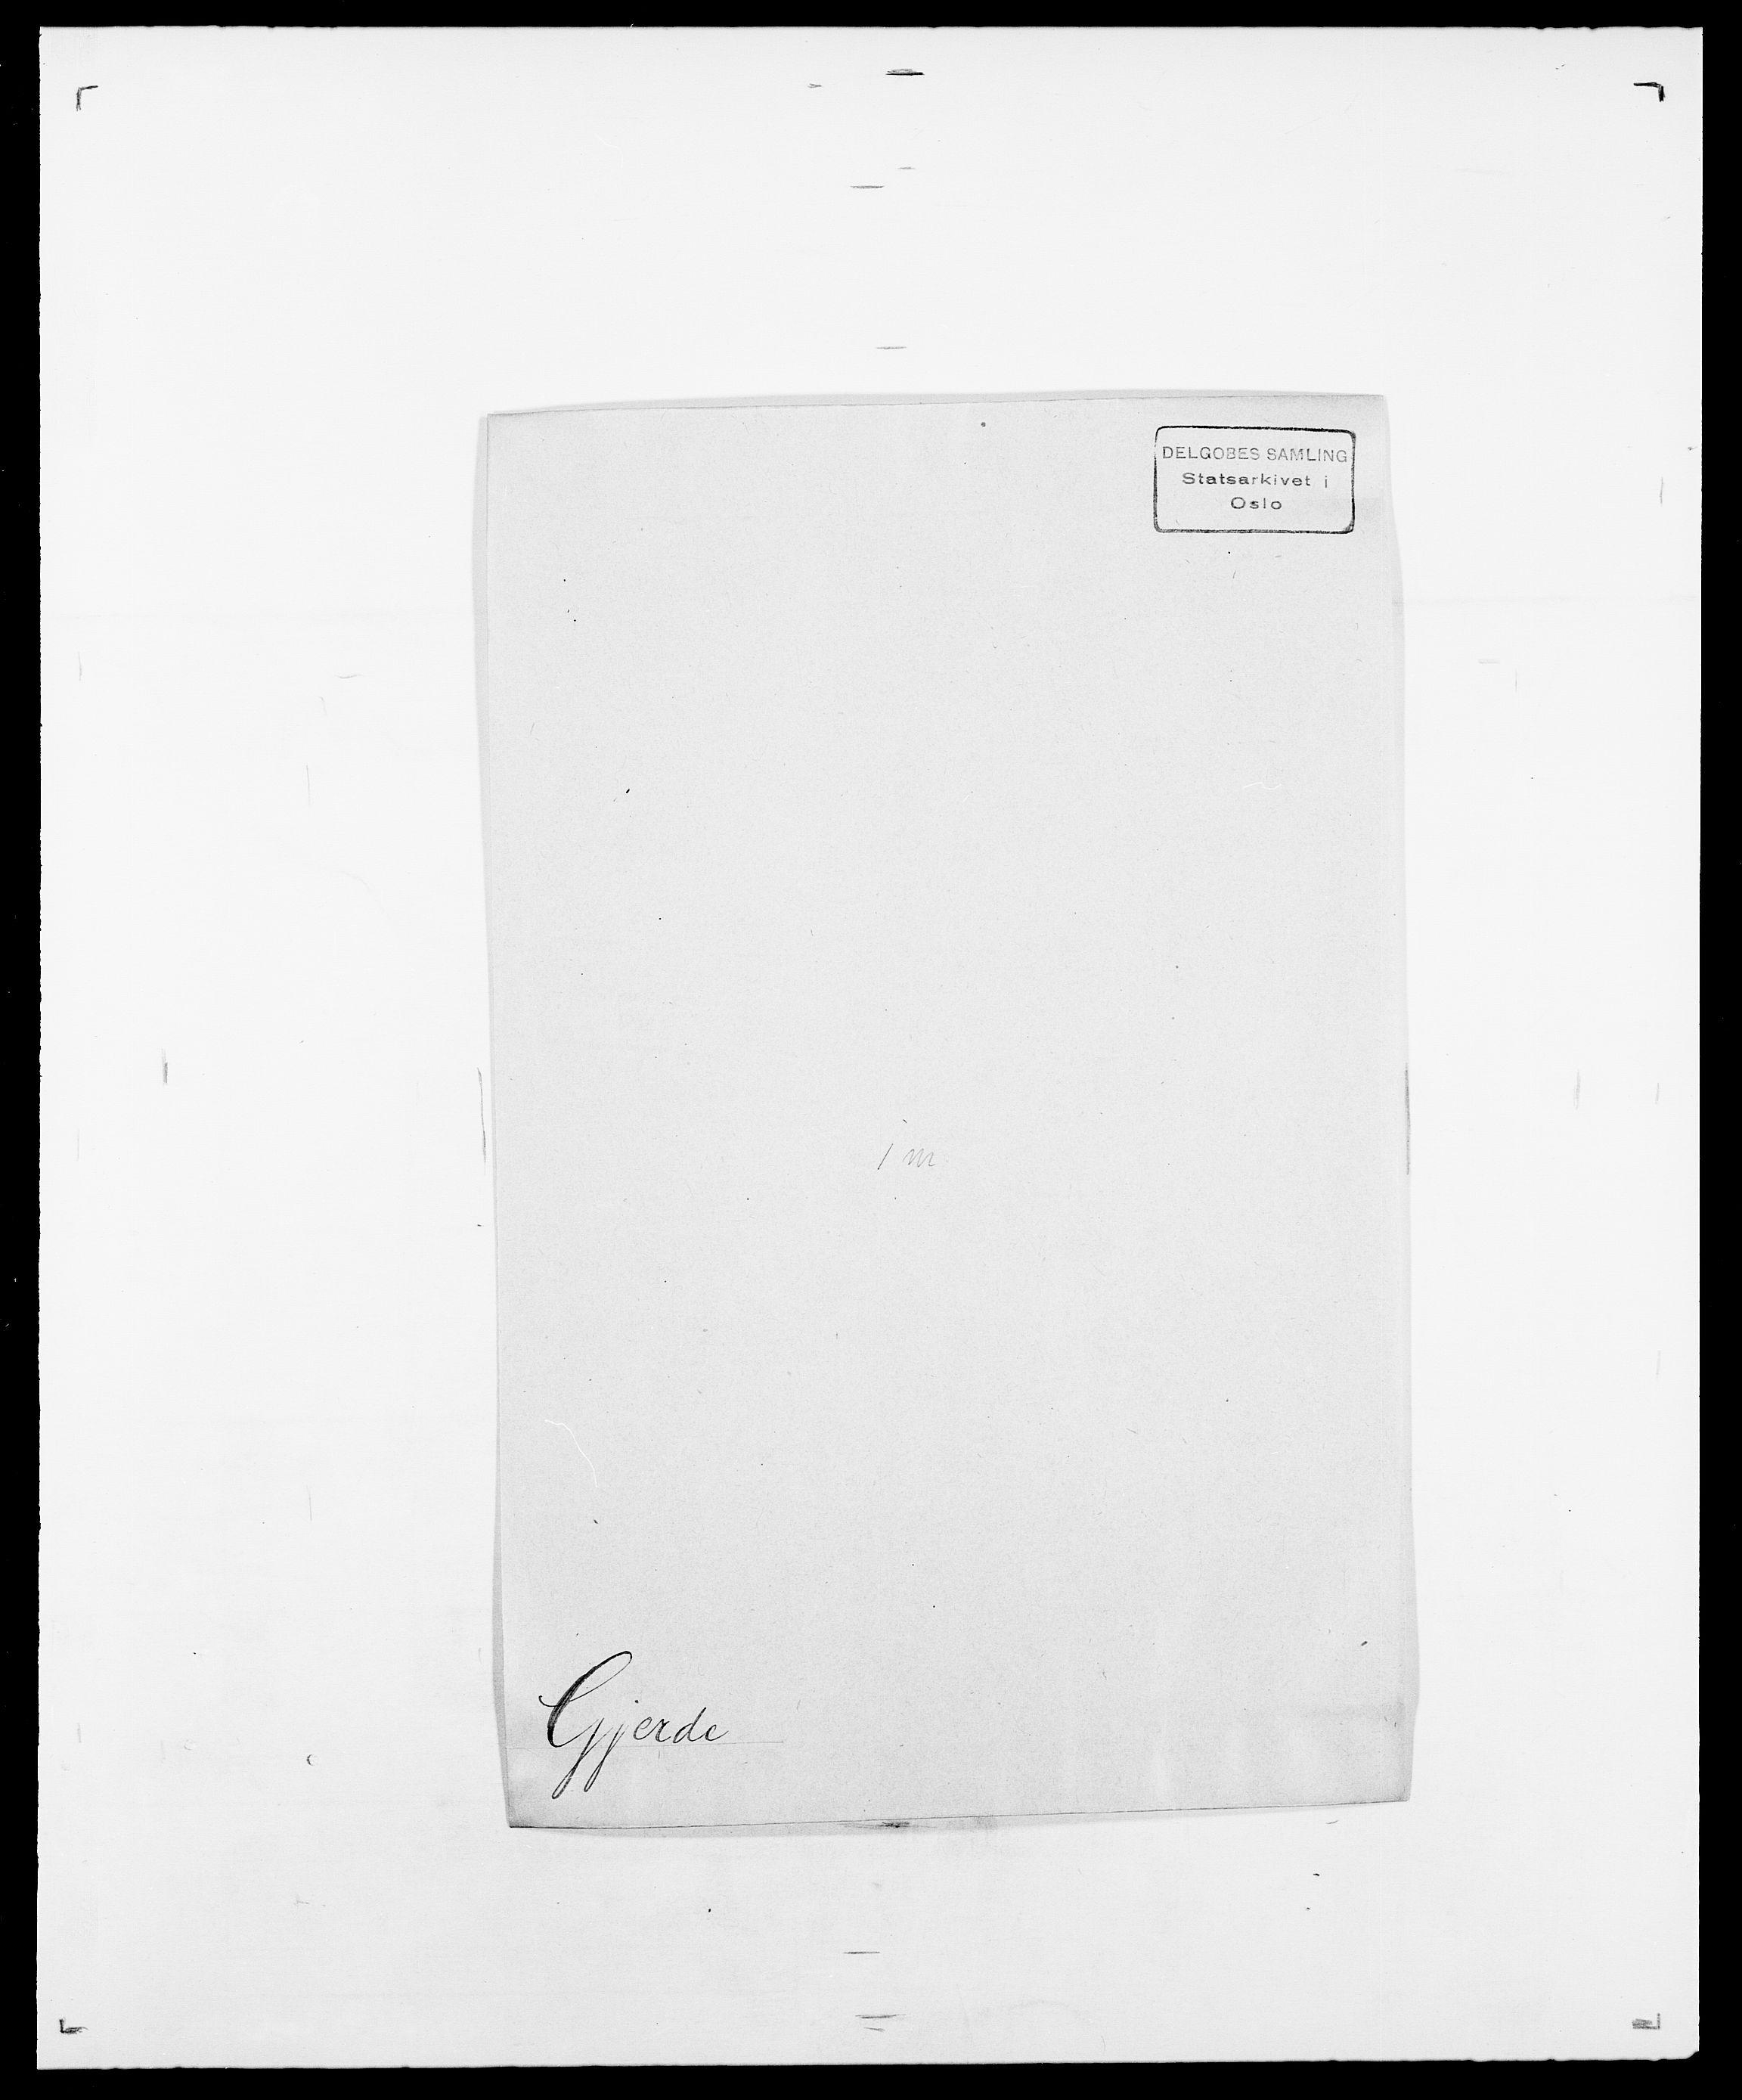 SAO, Delgobe, Charles Antoine - samling, D/Da/L0014: Giebdhausen - Grip, s. 105